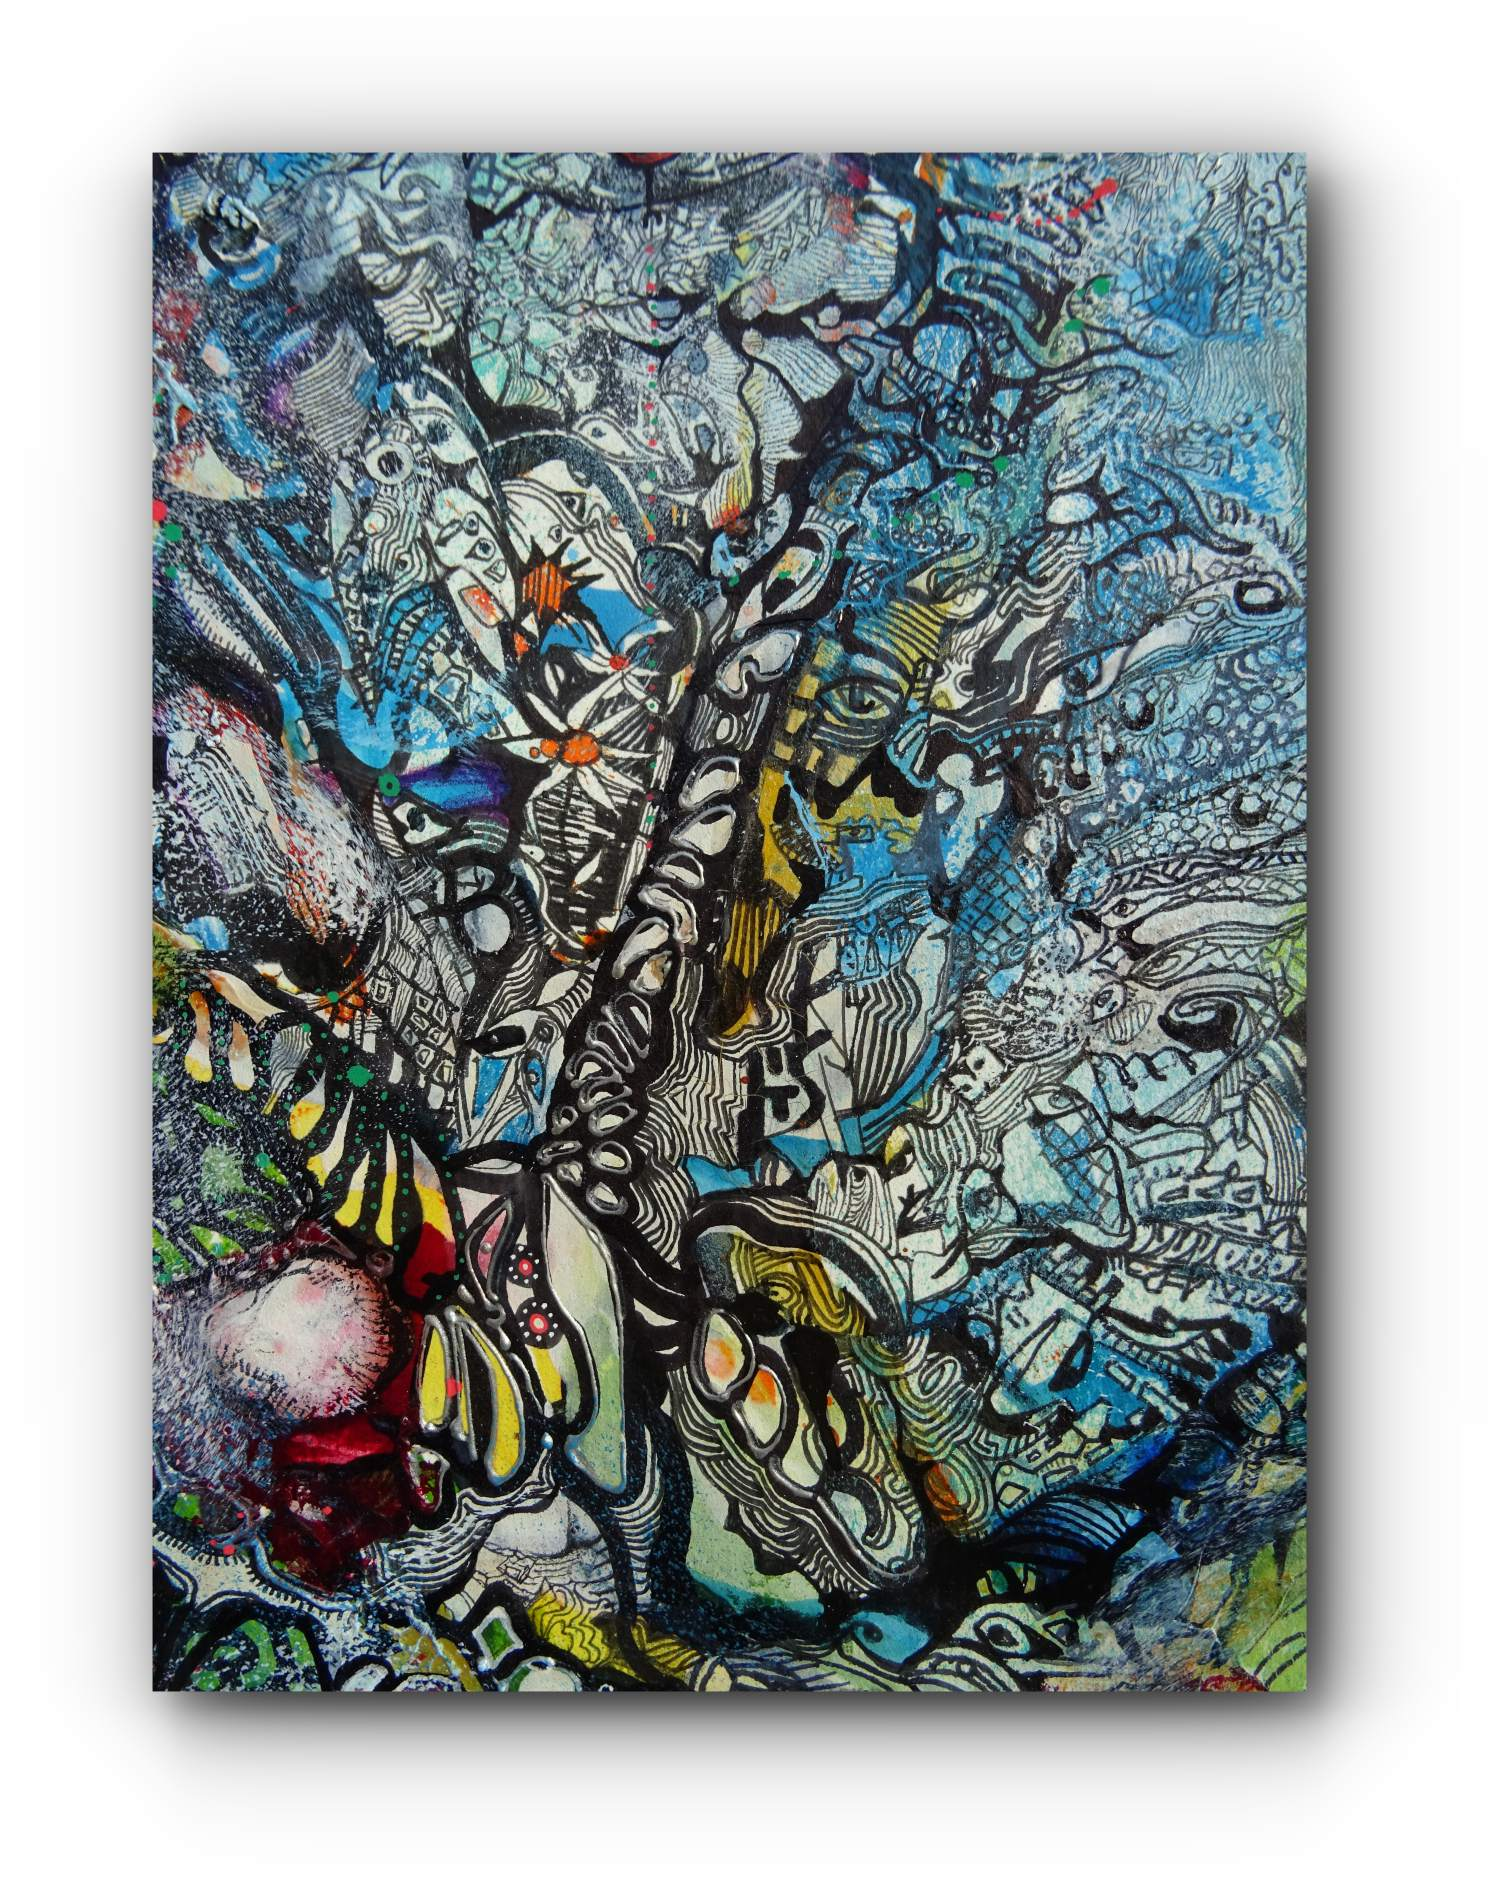 painting-detail-3-heart-forest-artists-ingress-vortices.jpg